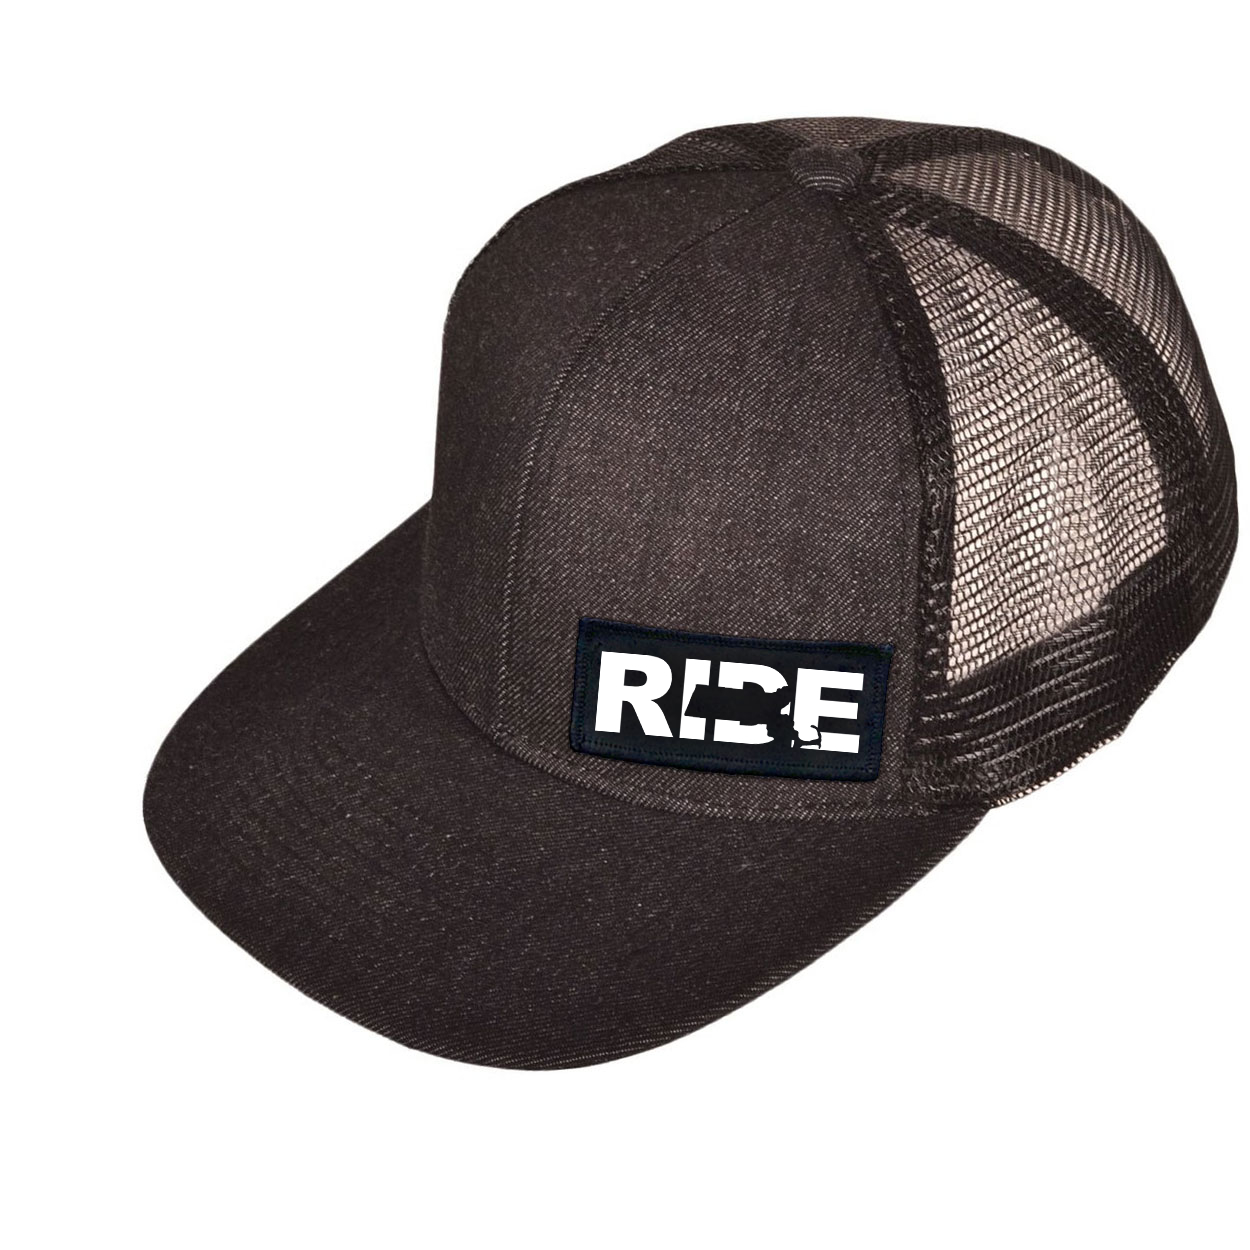 Ride Massachusetts Night Out Woven Patch Snapback Flat Brim Hat Black Denim (White Logo)